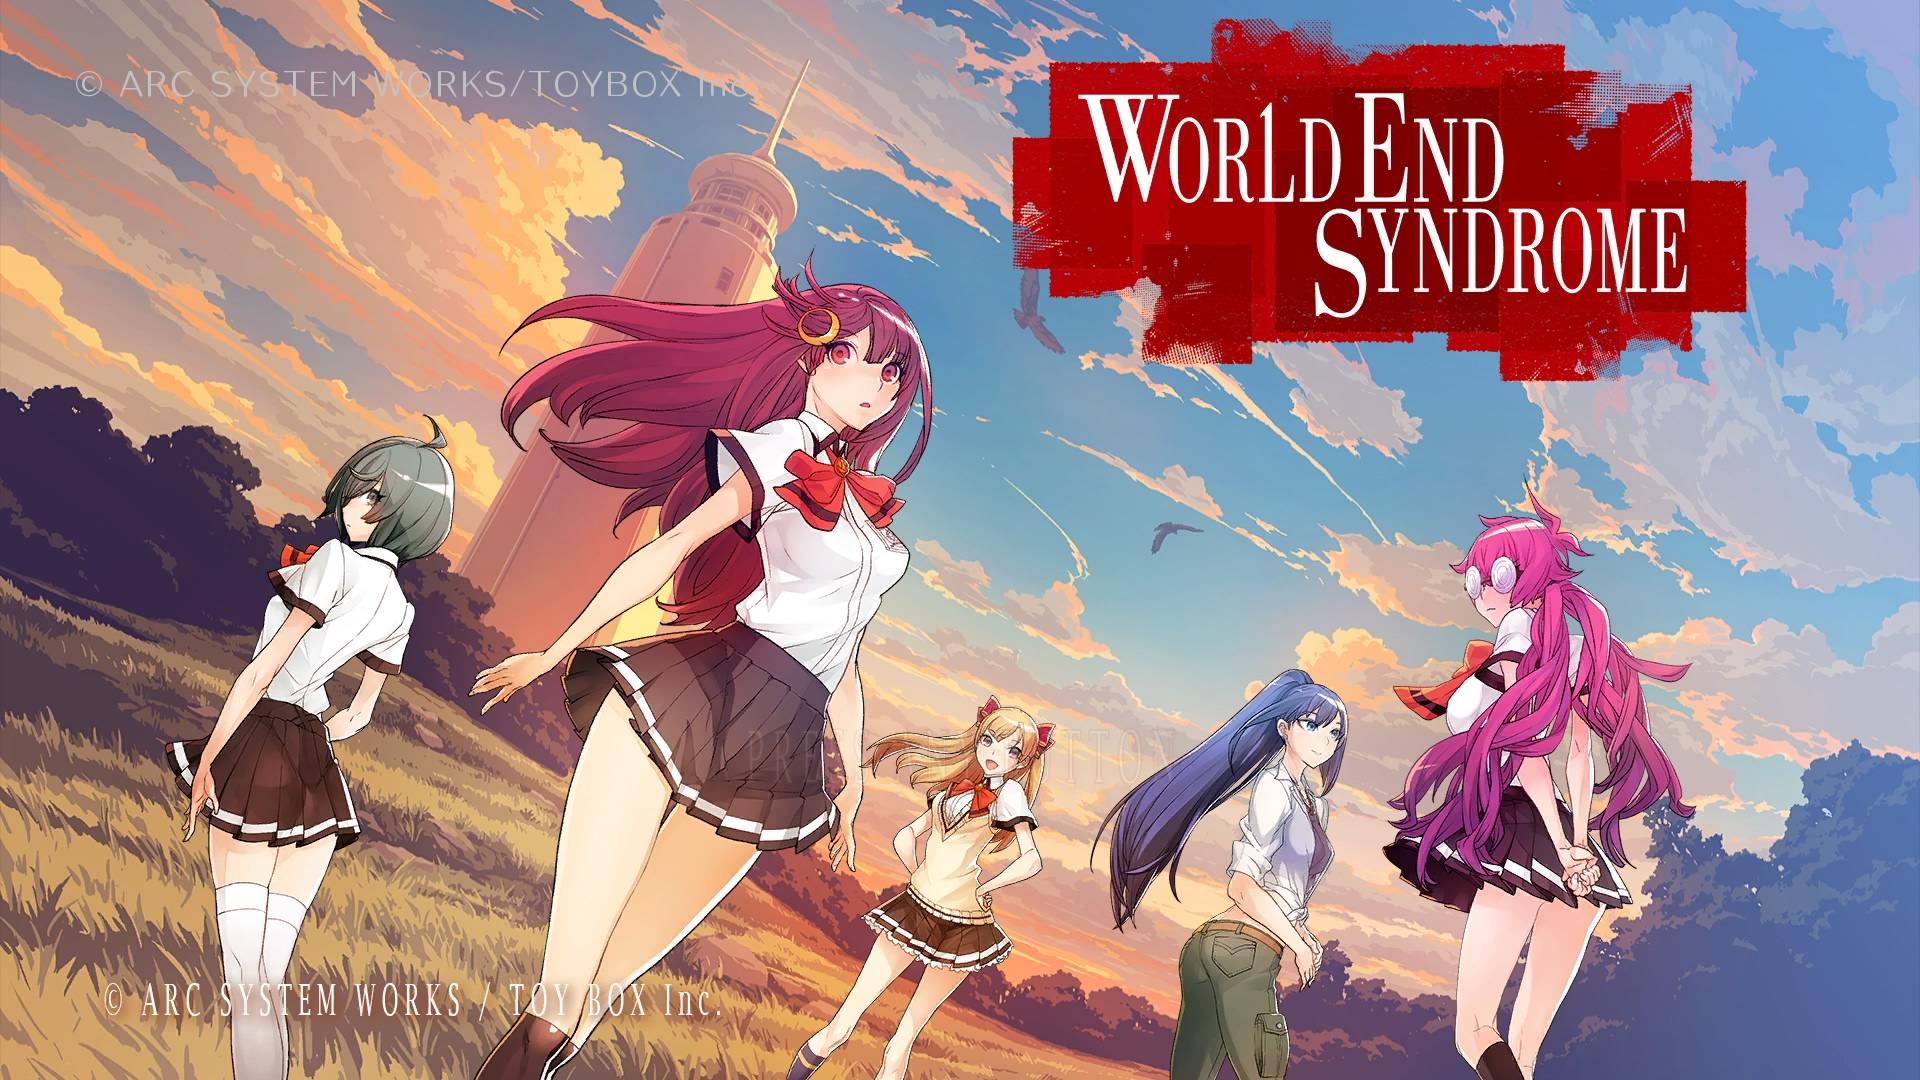 World End Syndrome (2019 – Visual Novel – Playstation 4)